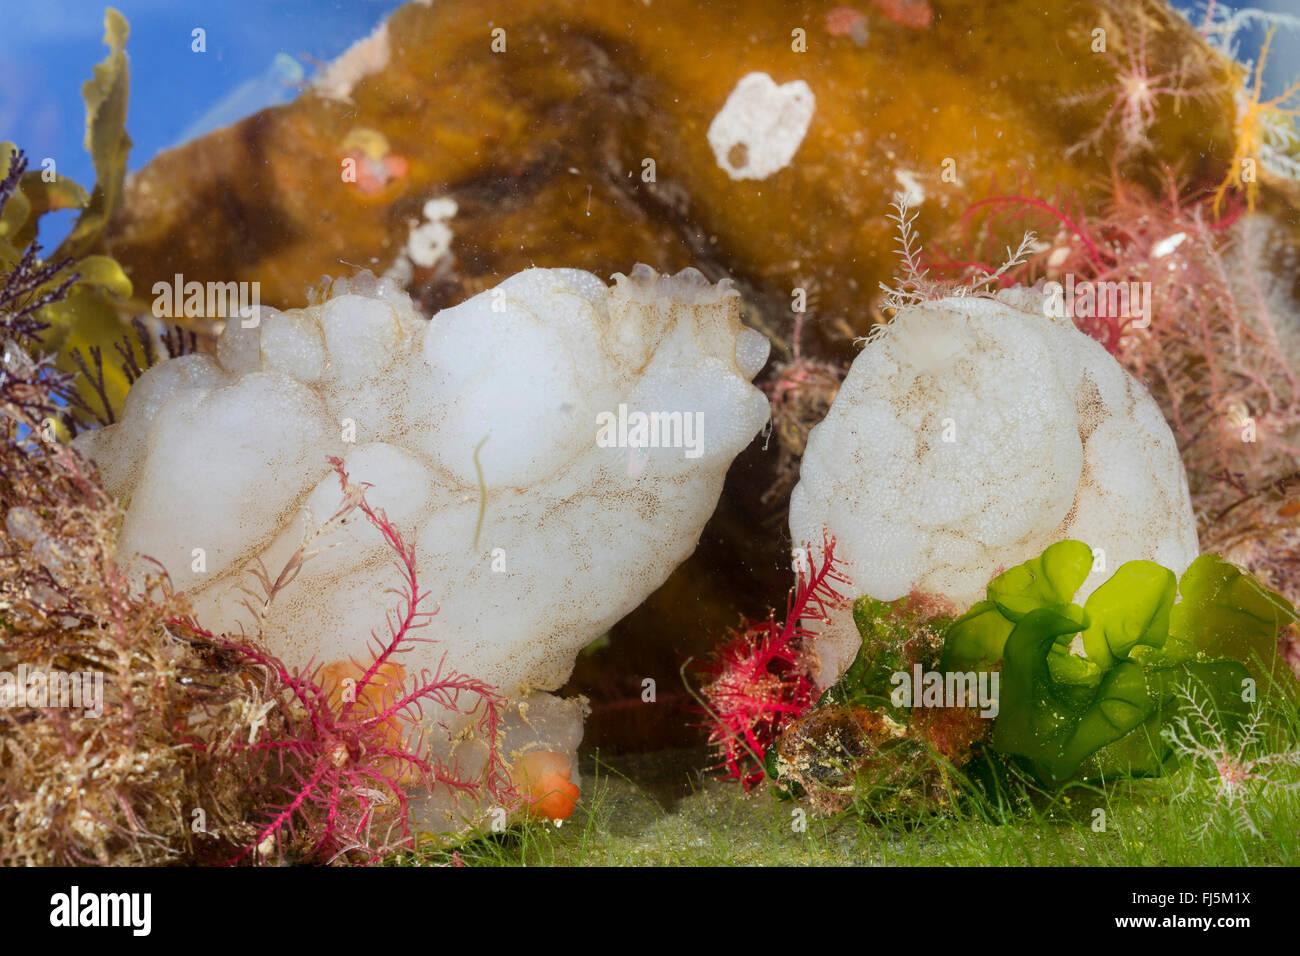 white sea-squirt, white sea squirt (Phallusia mammillata, Ascidia mammillata), two white sea-squirts on a stone - Stock Image